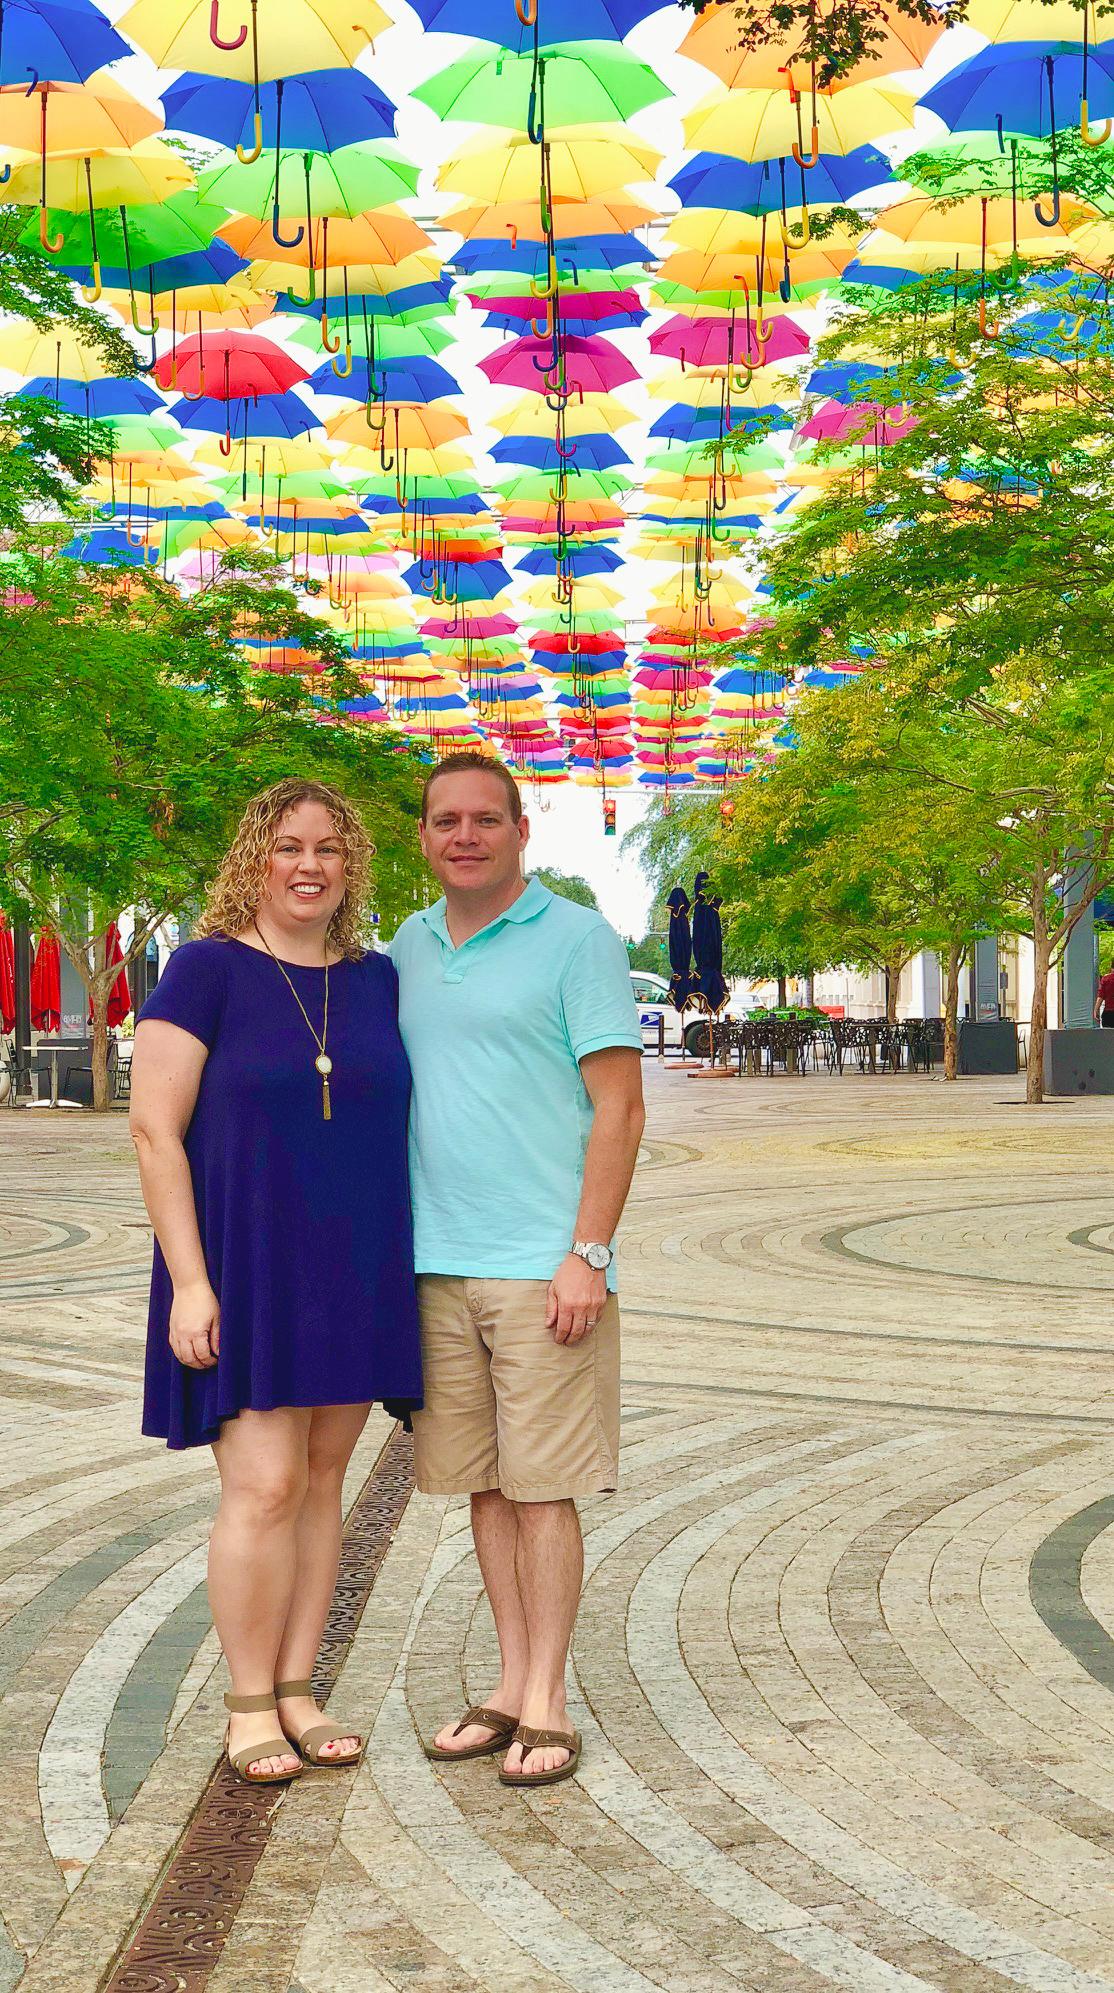 Keri and Mike at Umbrella Sky project